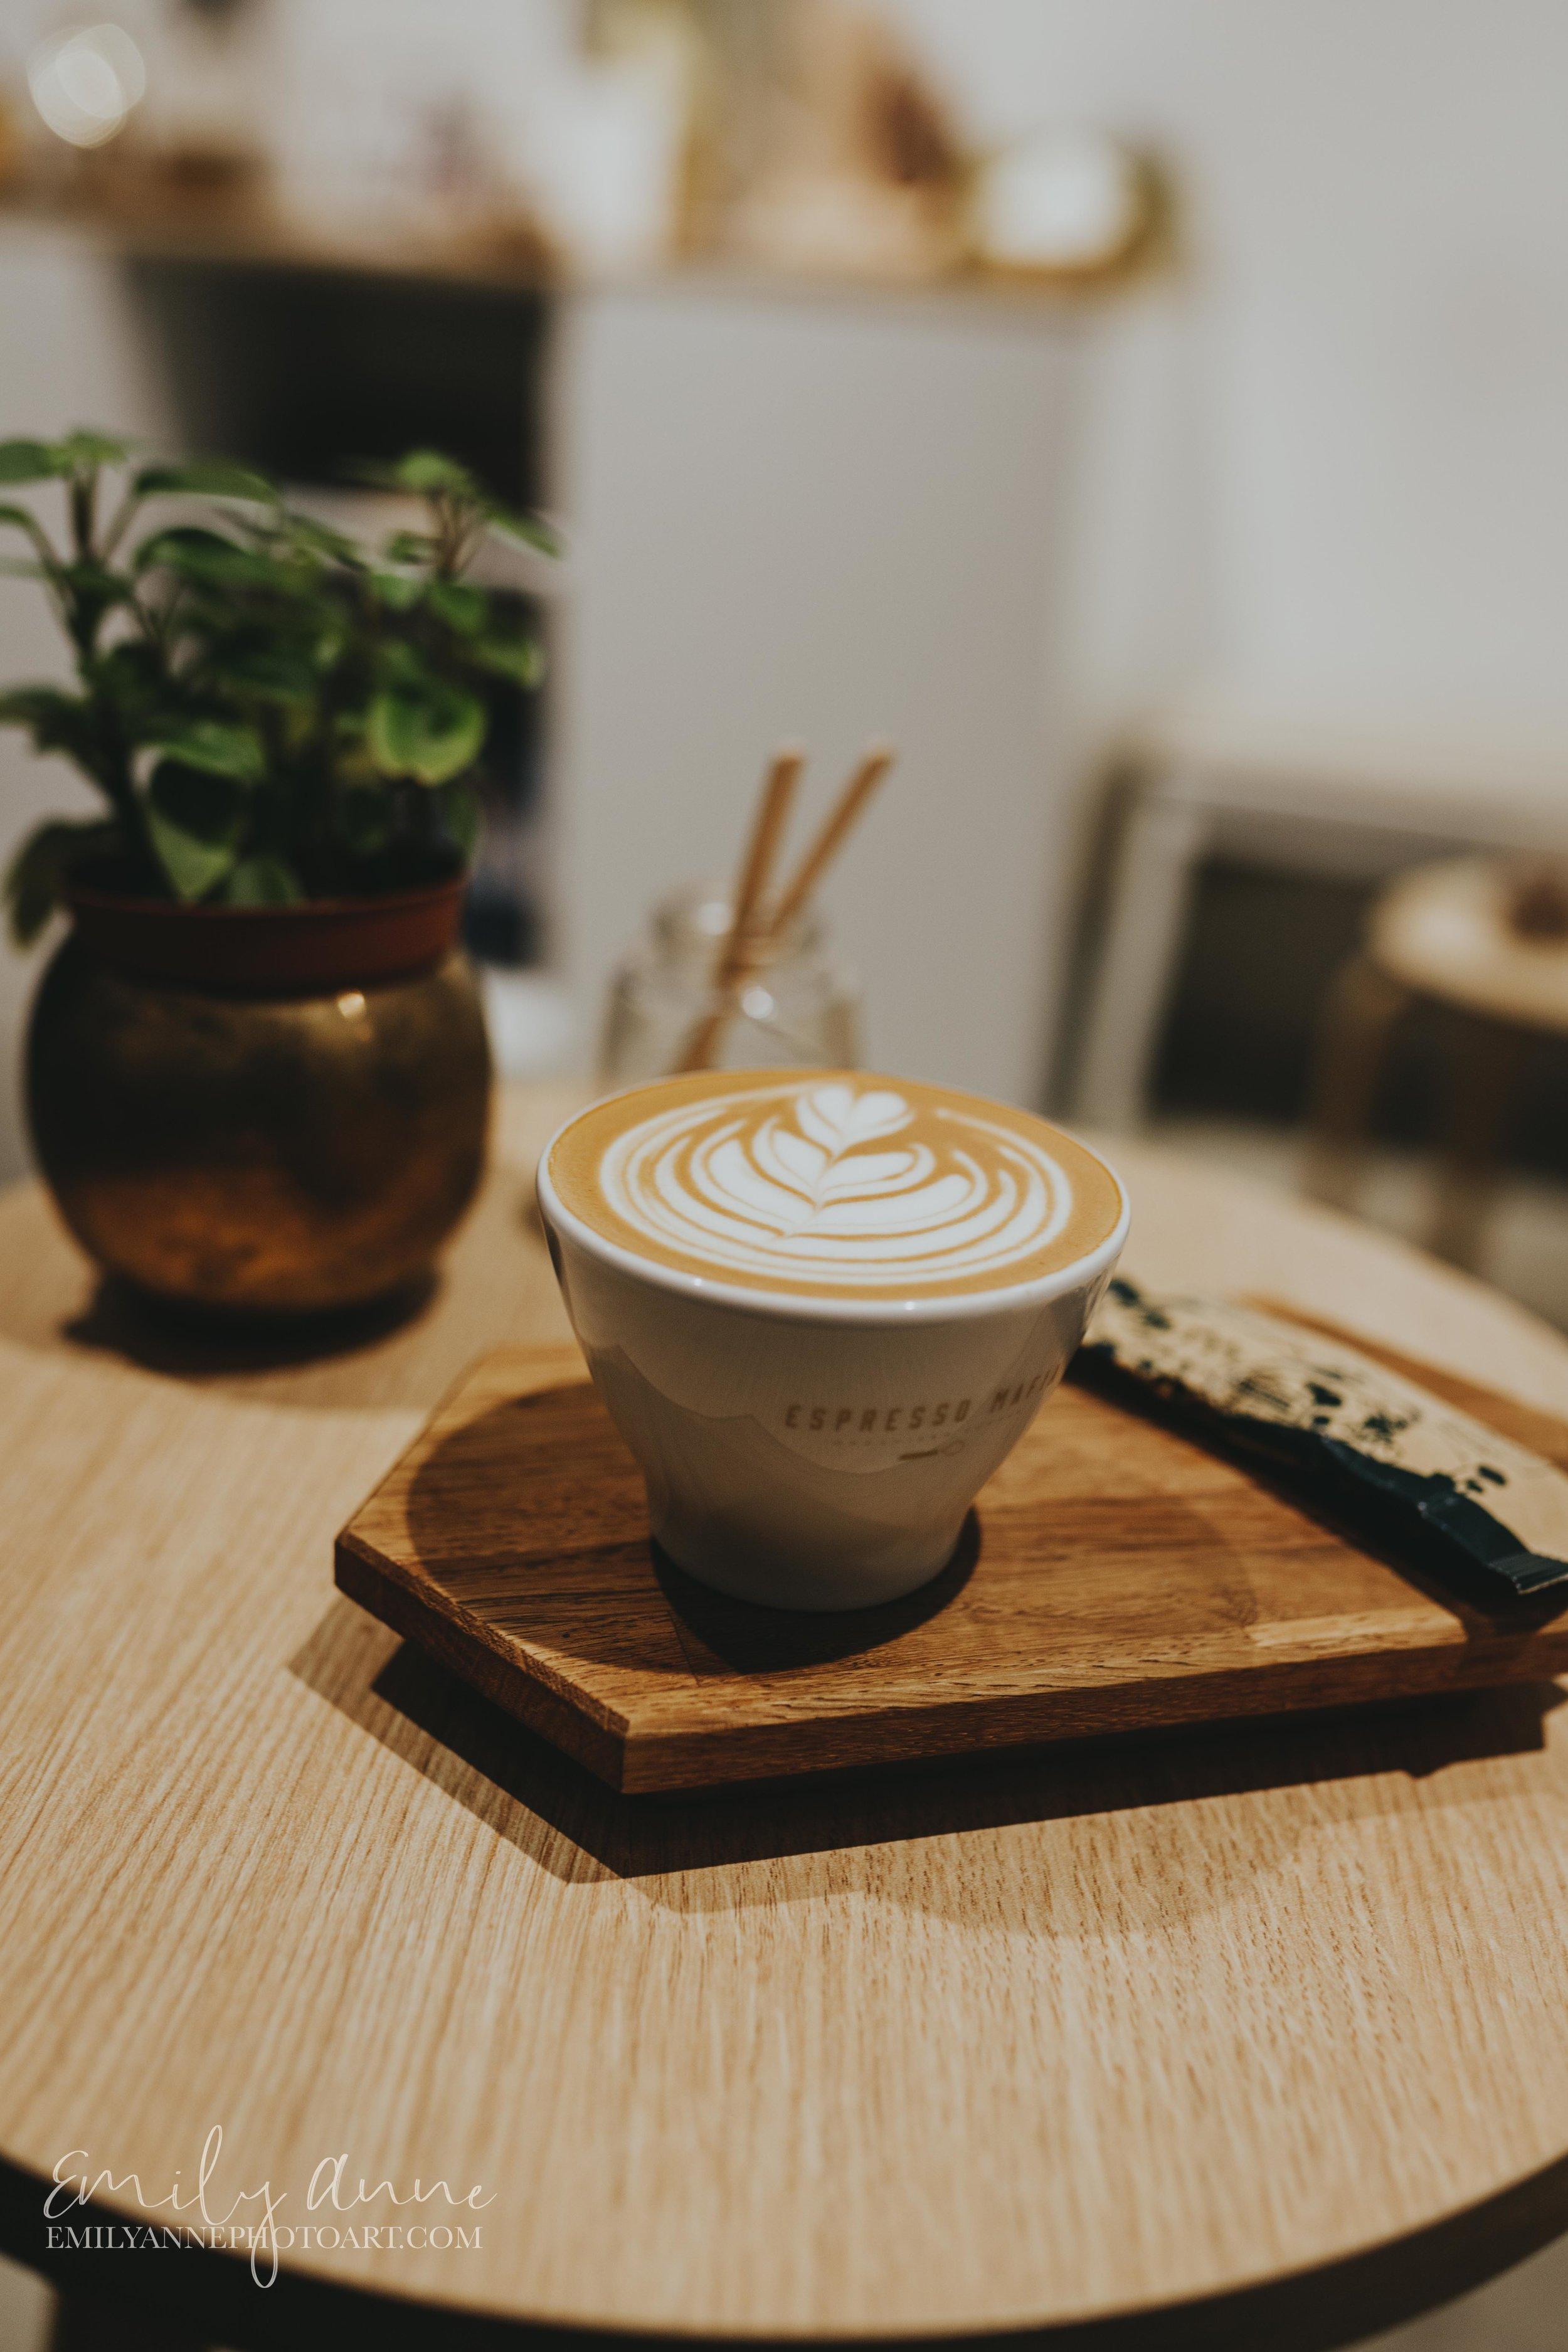 coffee latte art by best coffee photographer Nashville Barcelona Emily Anne Photo Art